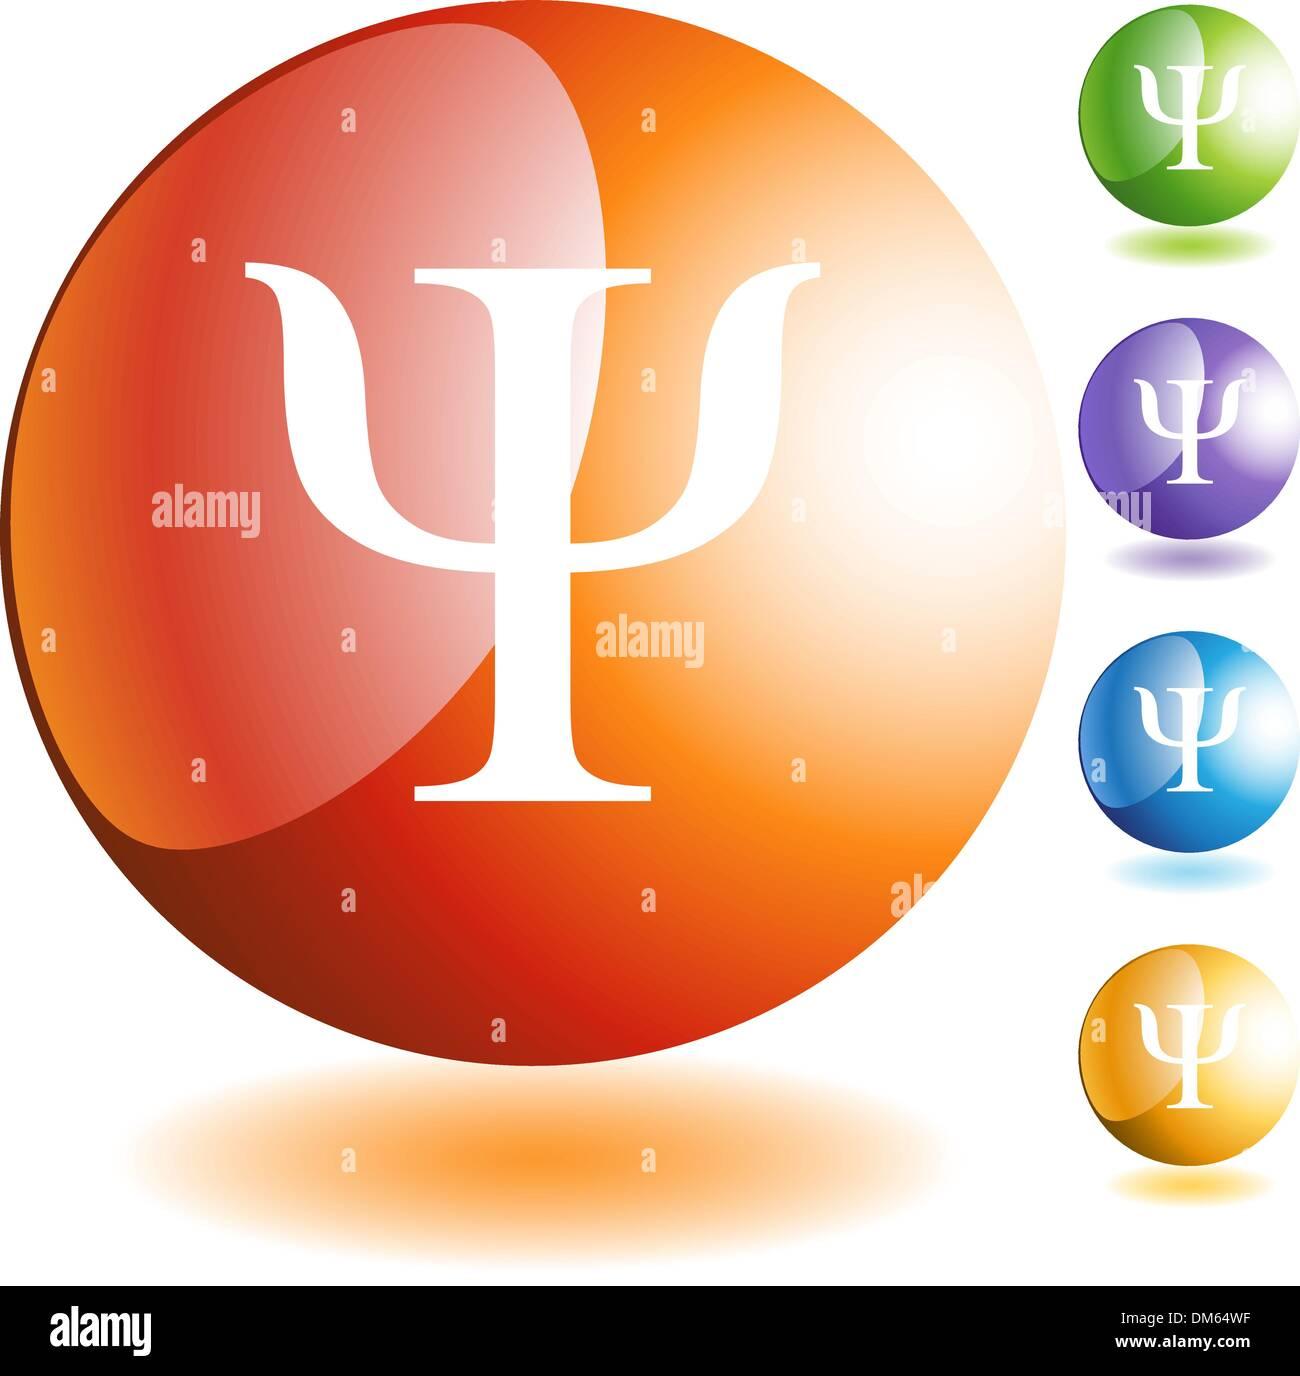 Greek Fraternity Symbol Icon - Stock Vector